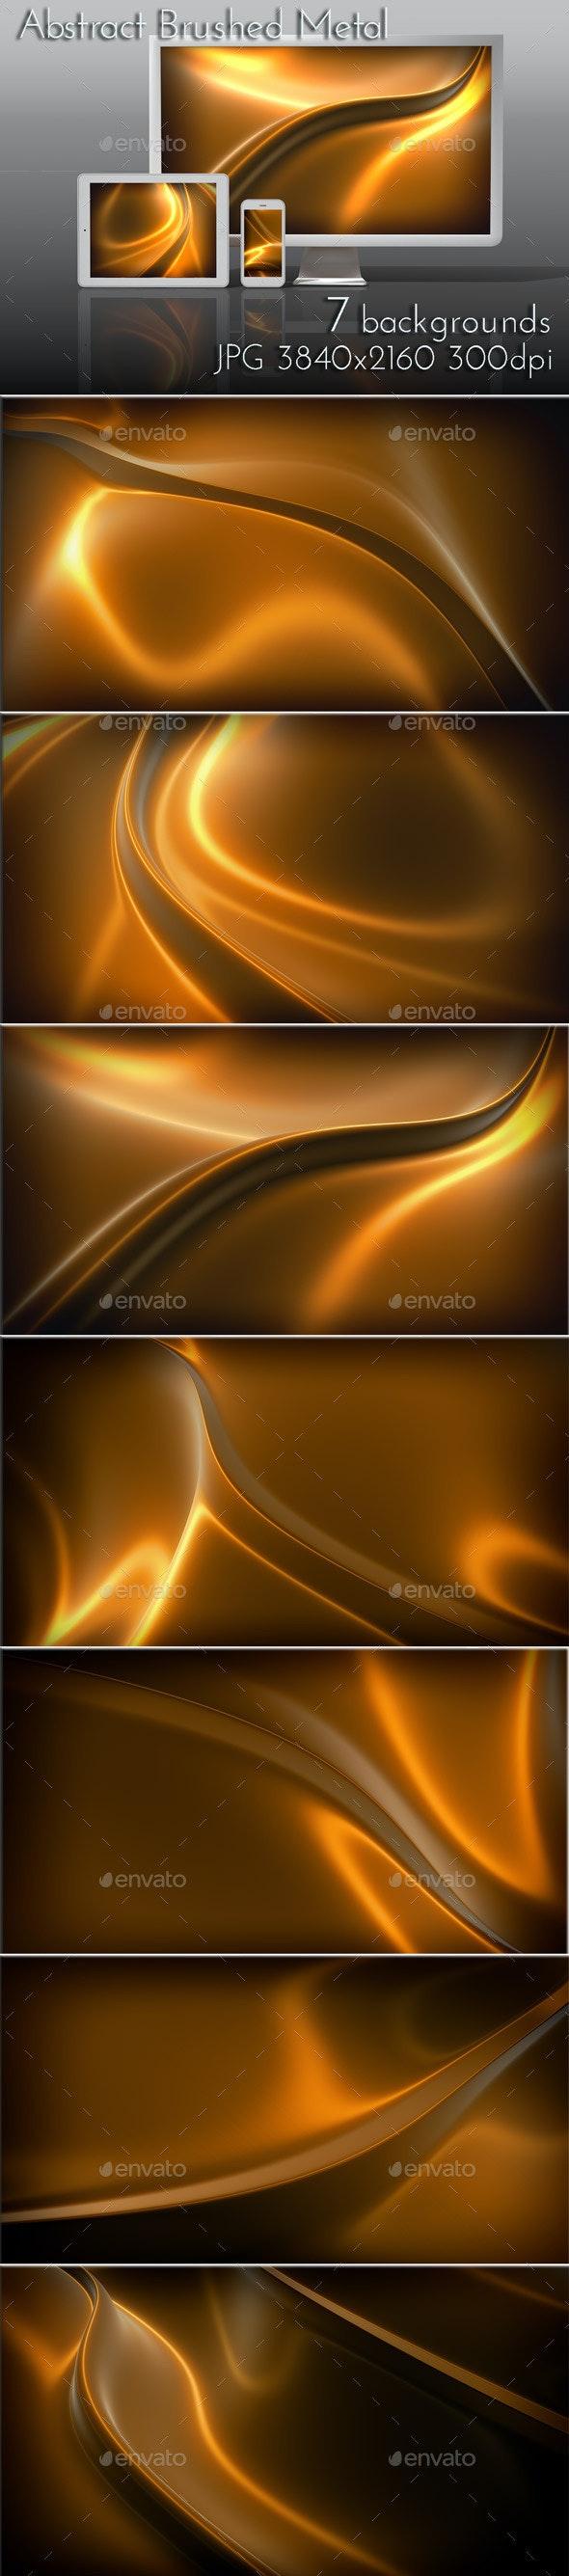 Bronze Metal Brushed Surface - 3D Backgrounds